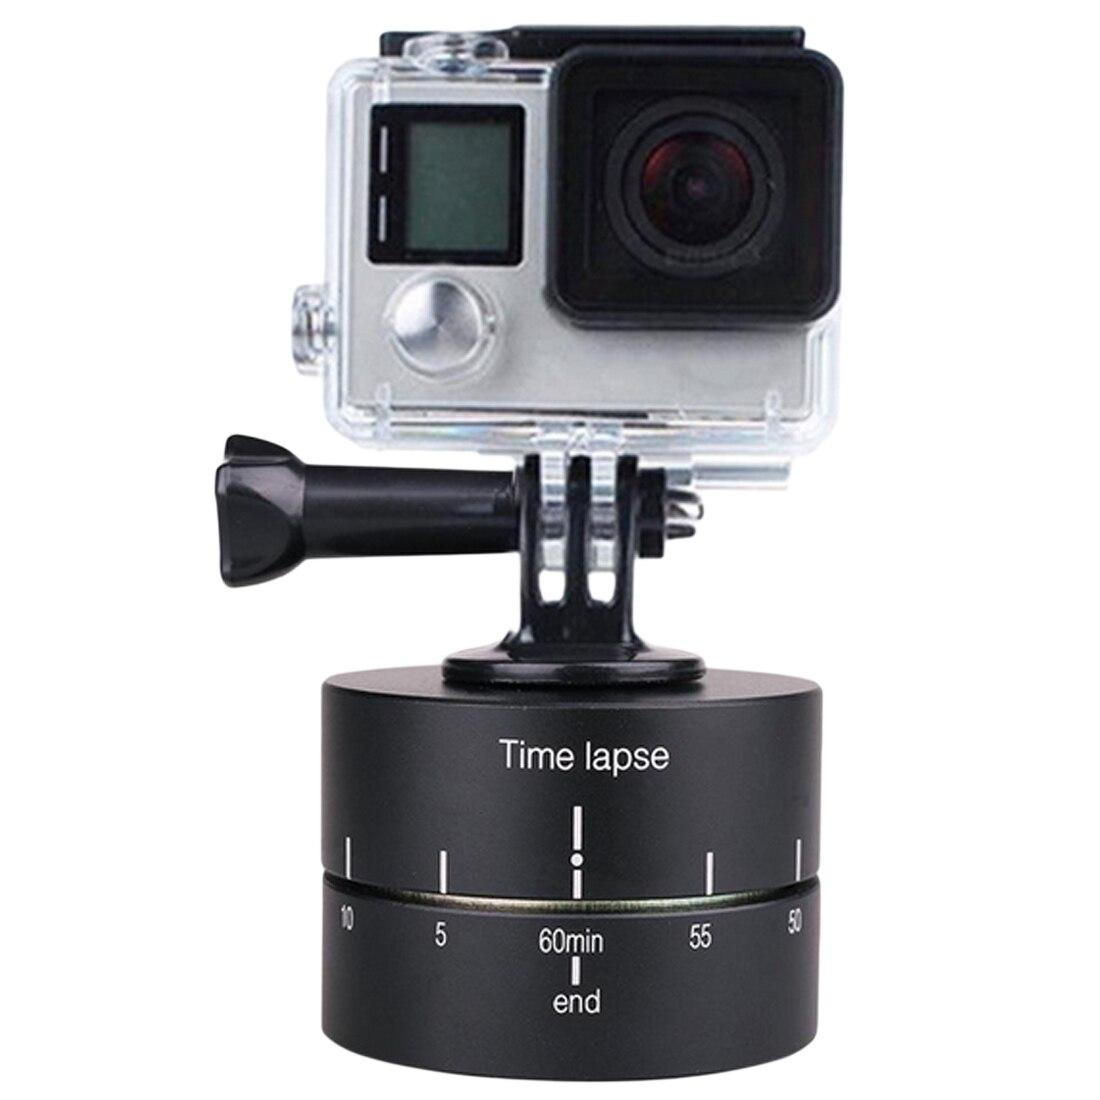 HONGDAK Time lapse 360 Degree Auto Rotate Camera Tripod Head Base Time lapse 120minutes For Xiaoyi GoCamera SLR For iPhone